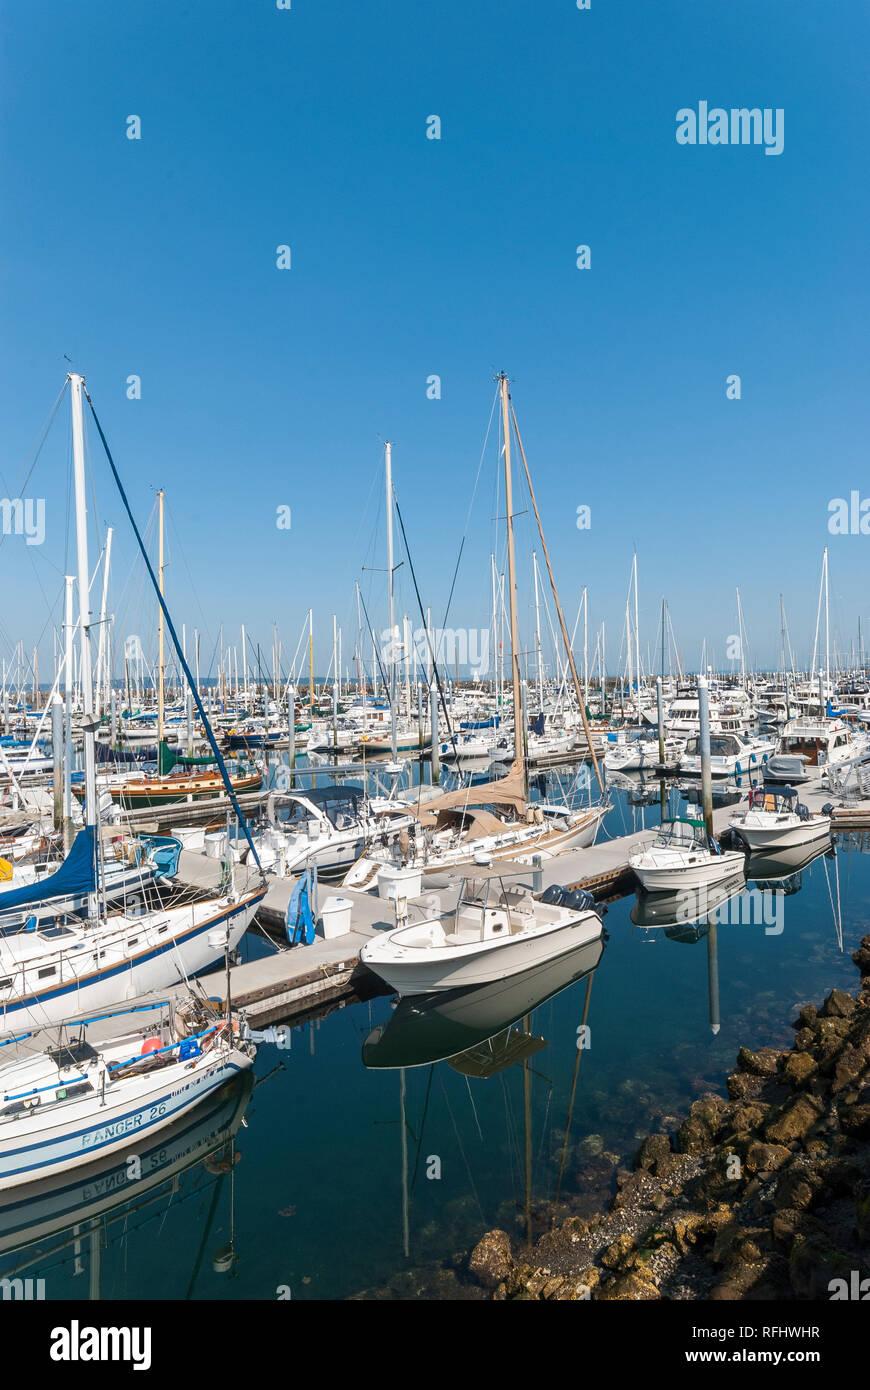 The marina at Ballard, Washington. - Stock Image